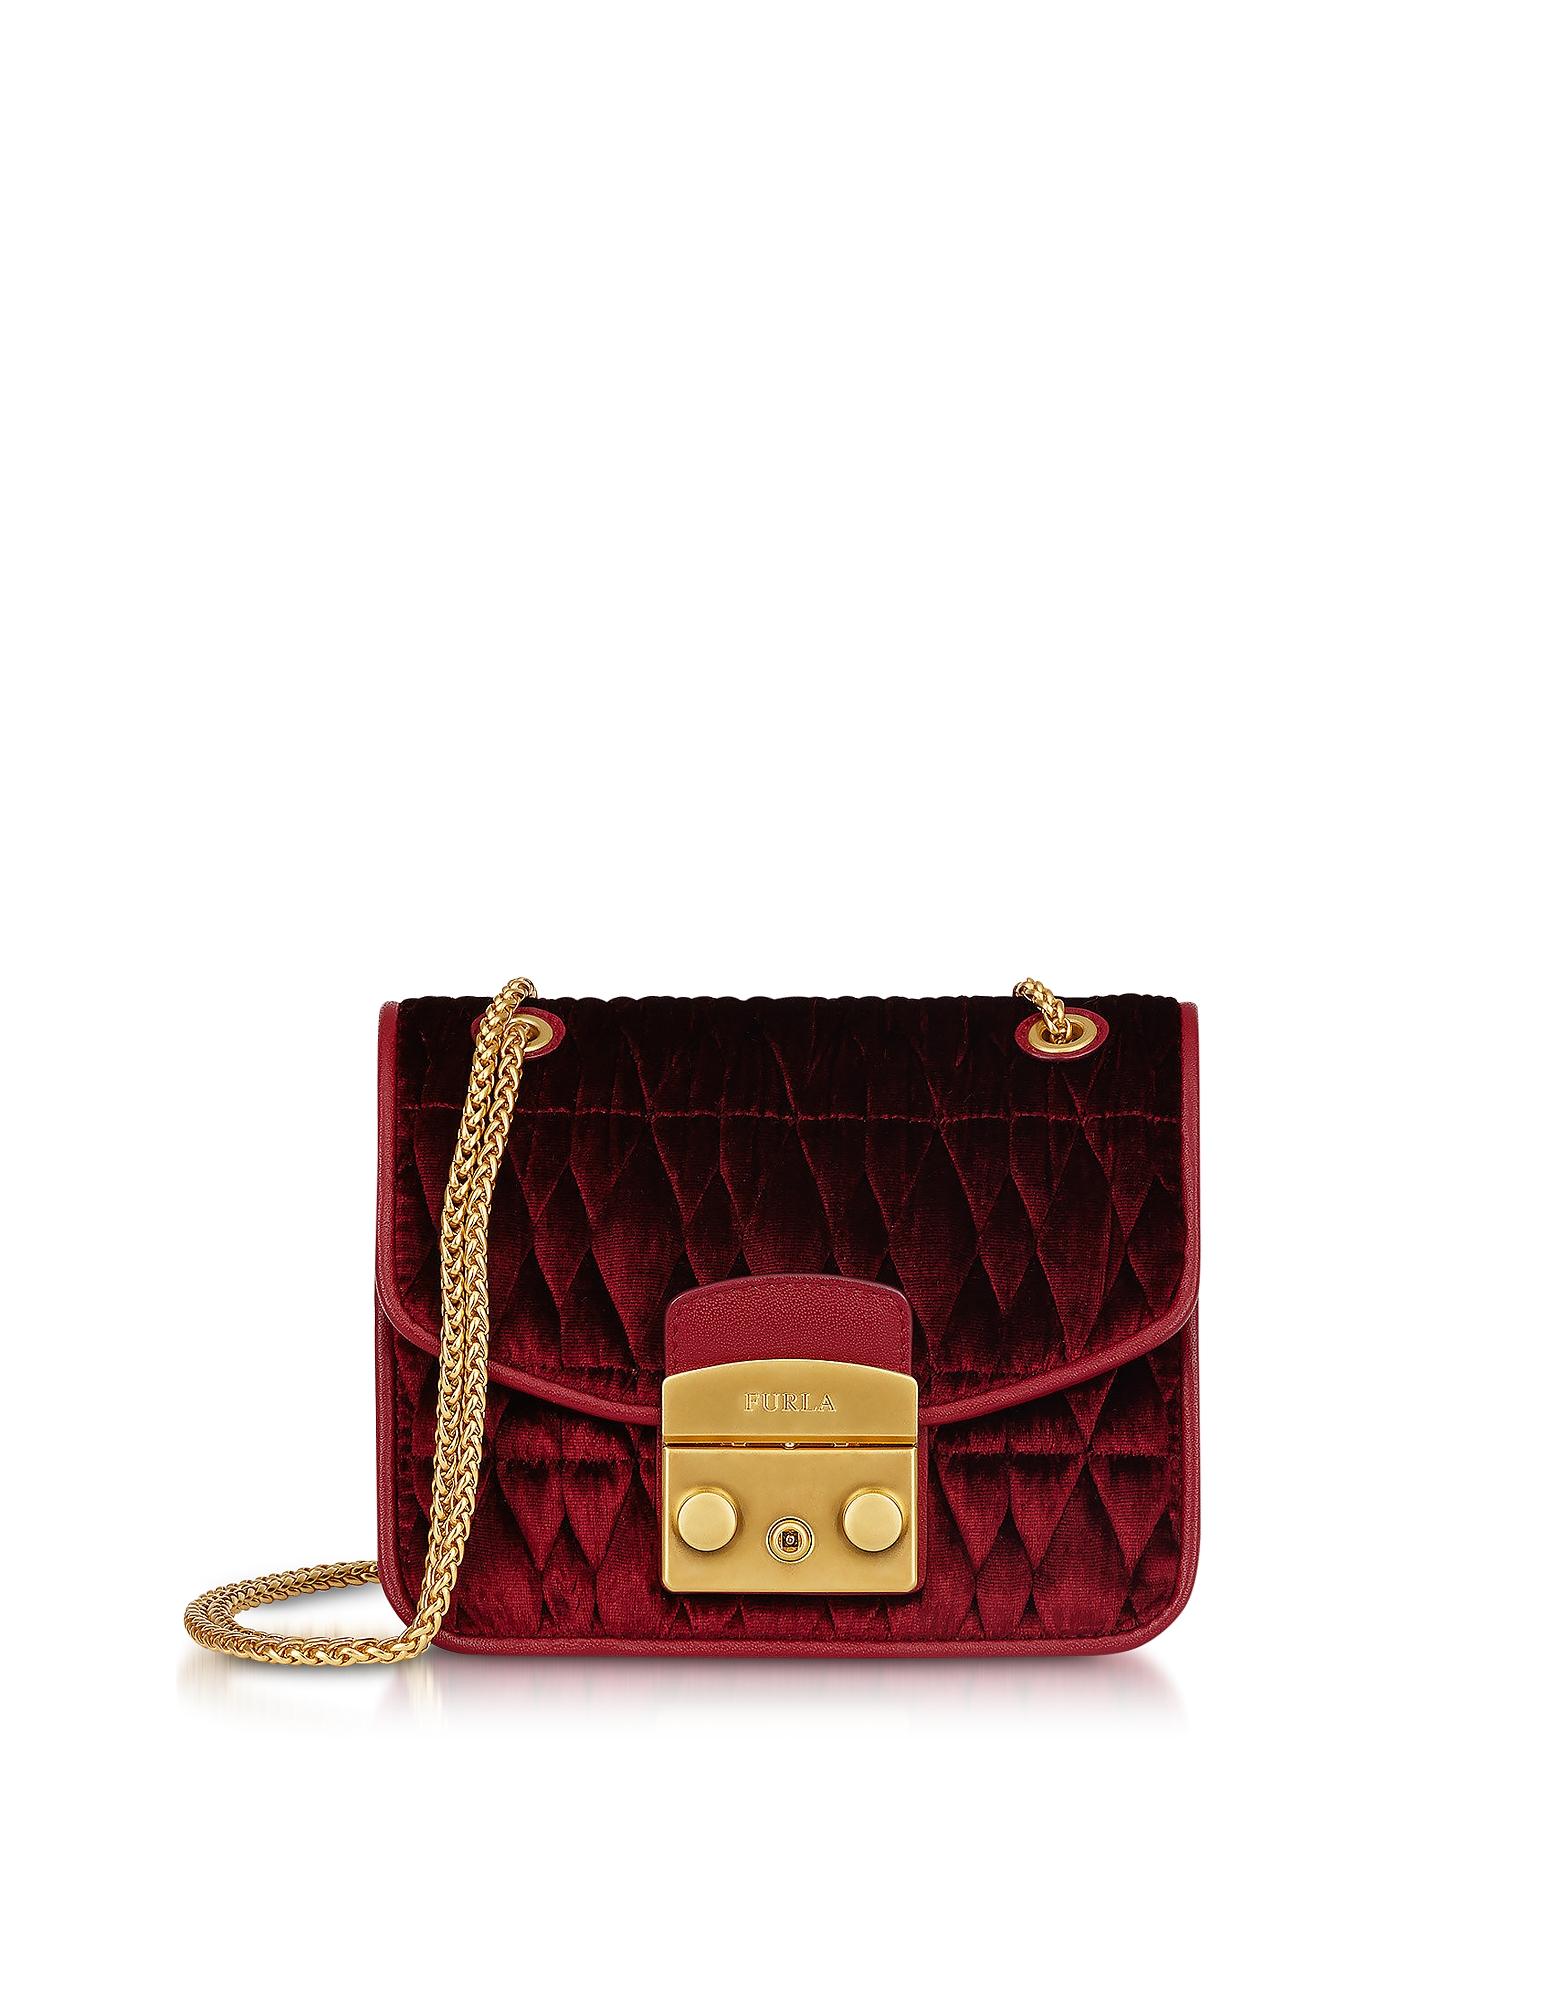 Quilted Velvet Metropolis Cometa Mini Crossbody Bag in Rosso Red/Gold